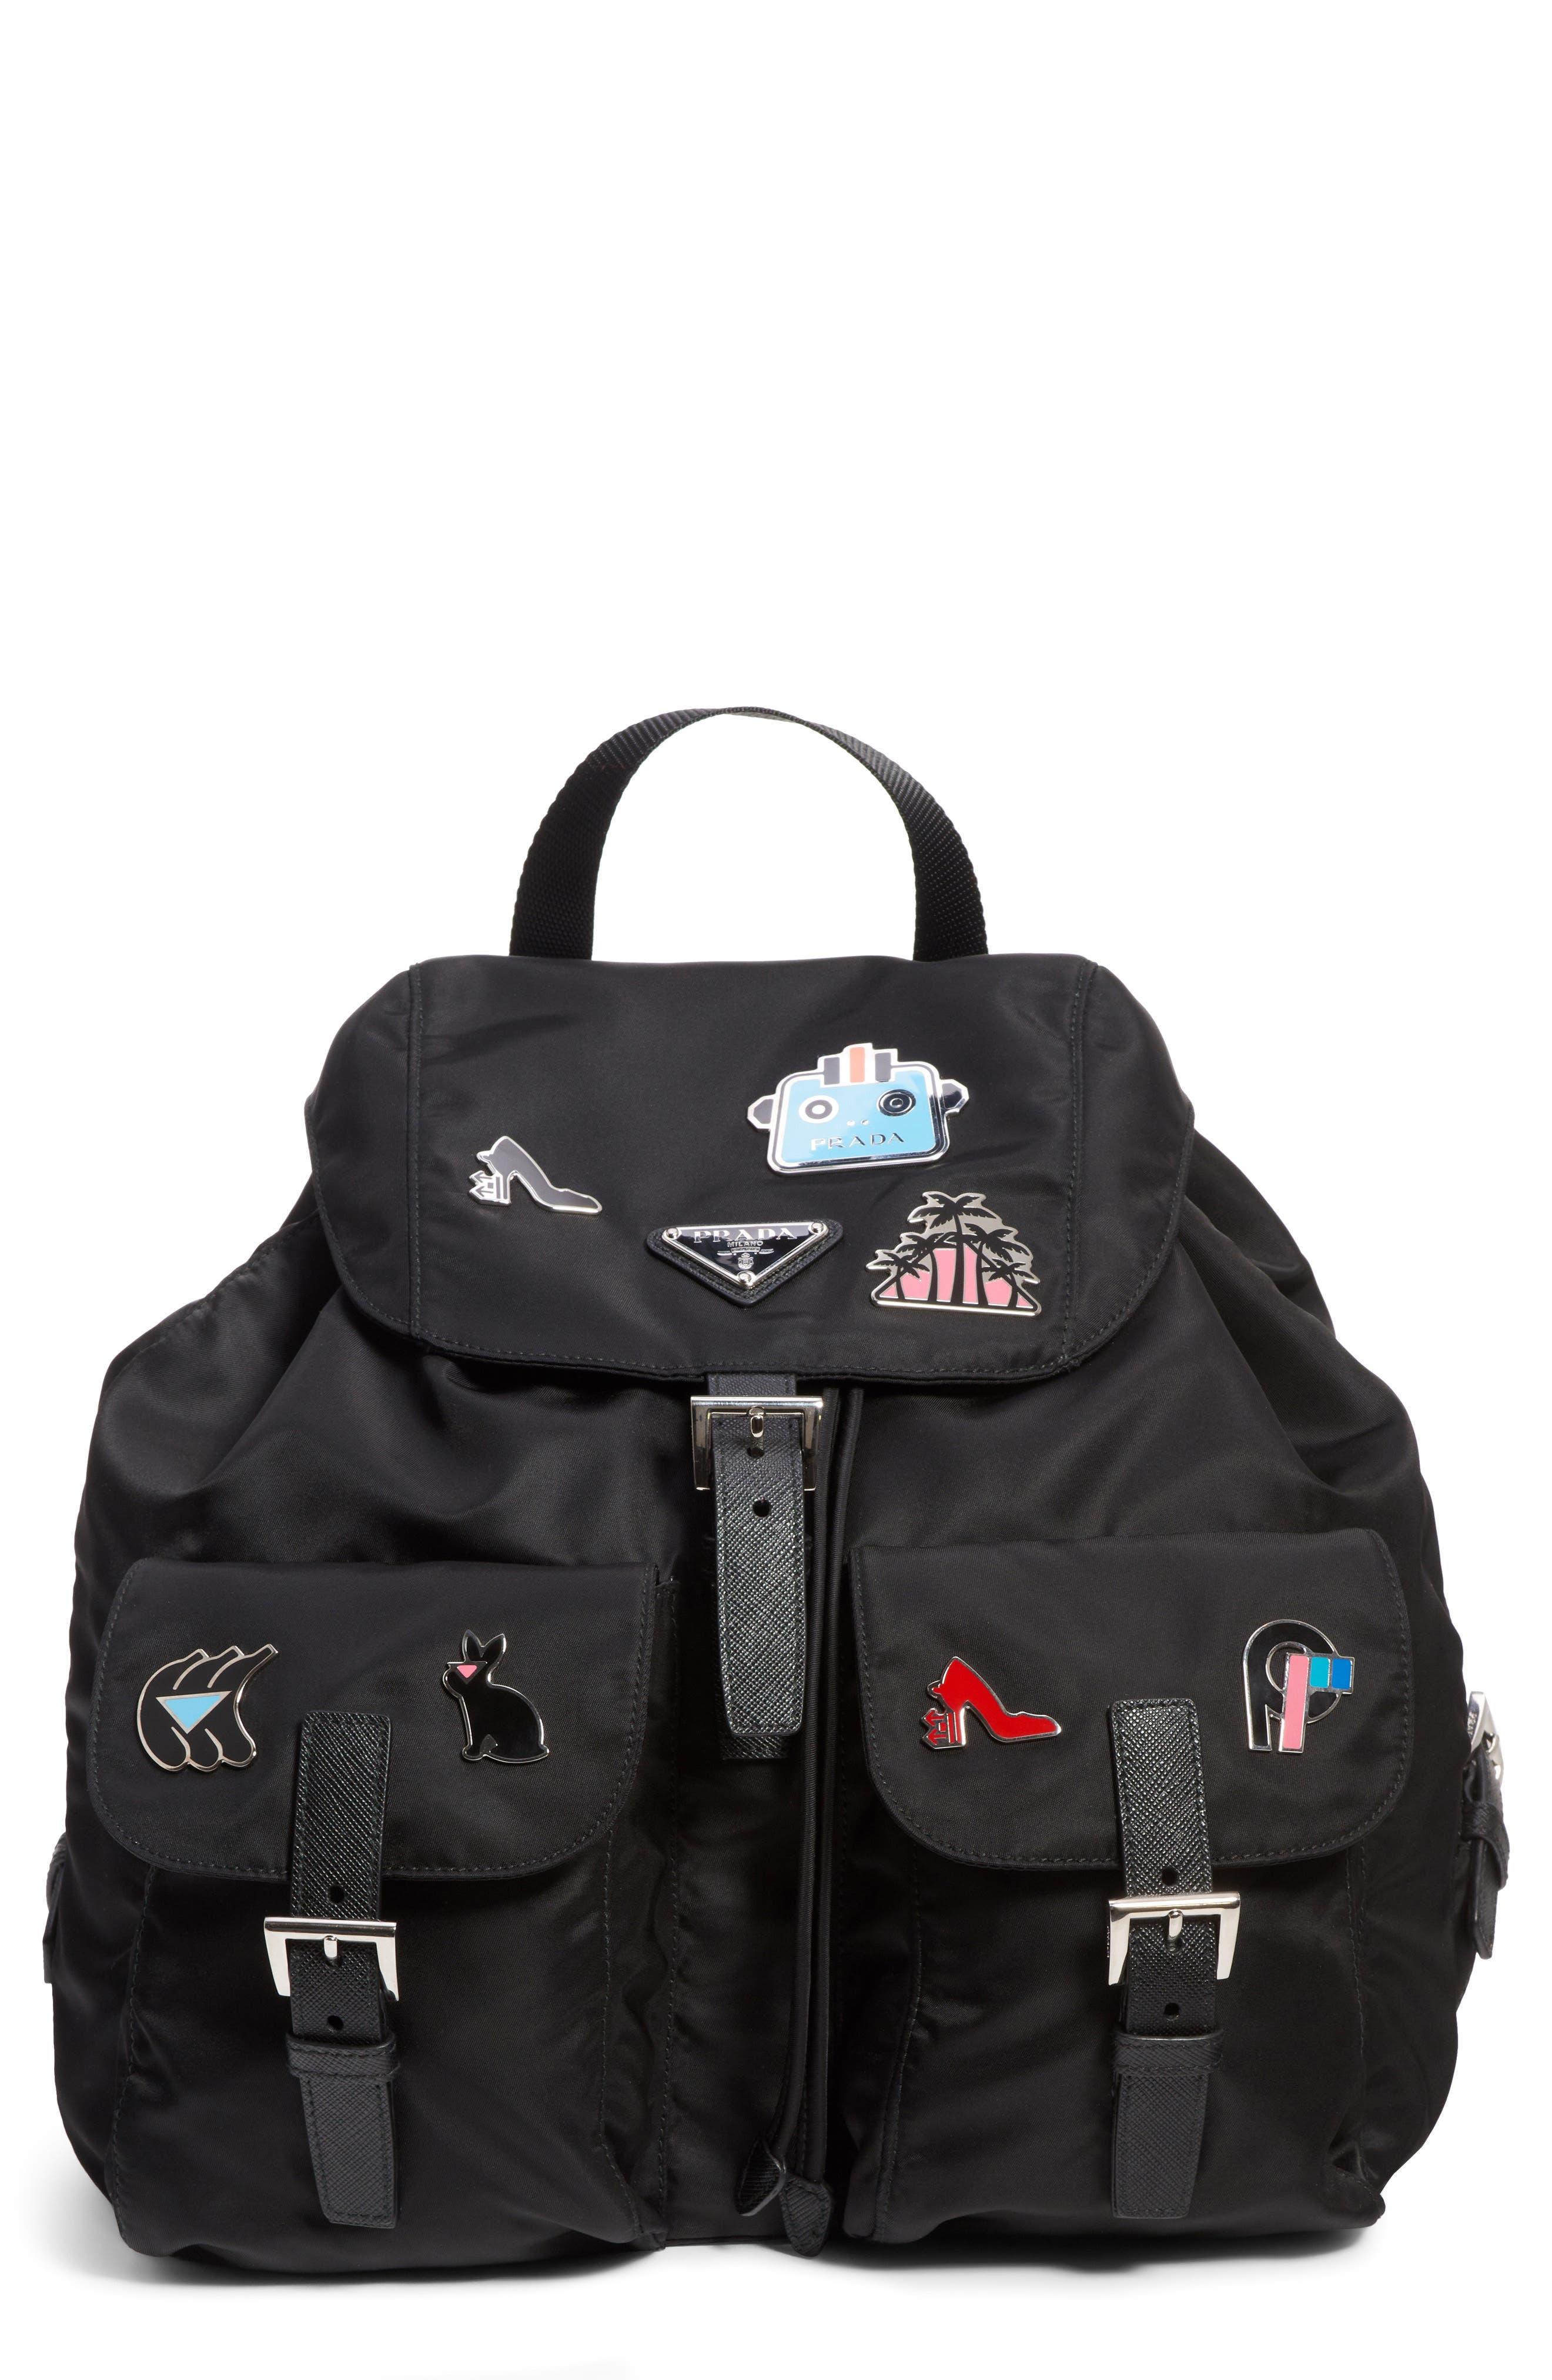 1a1bee75fb38 ... discount prada embellished nylon backpack 7e492 e435d